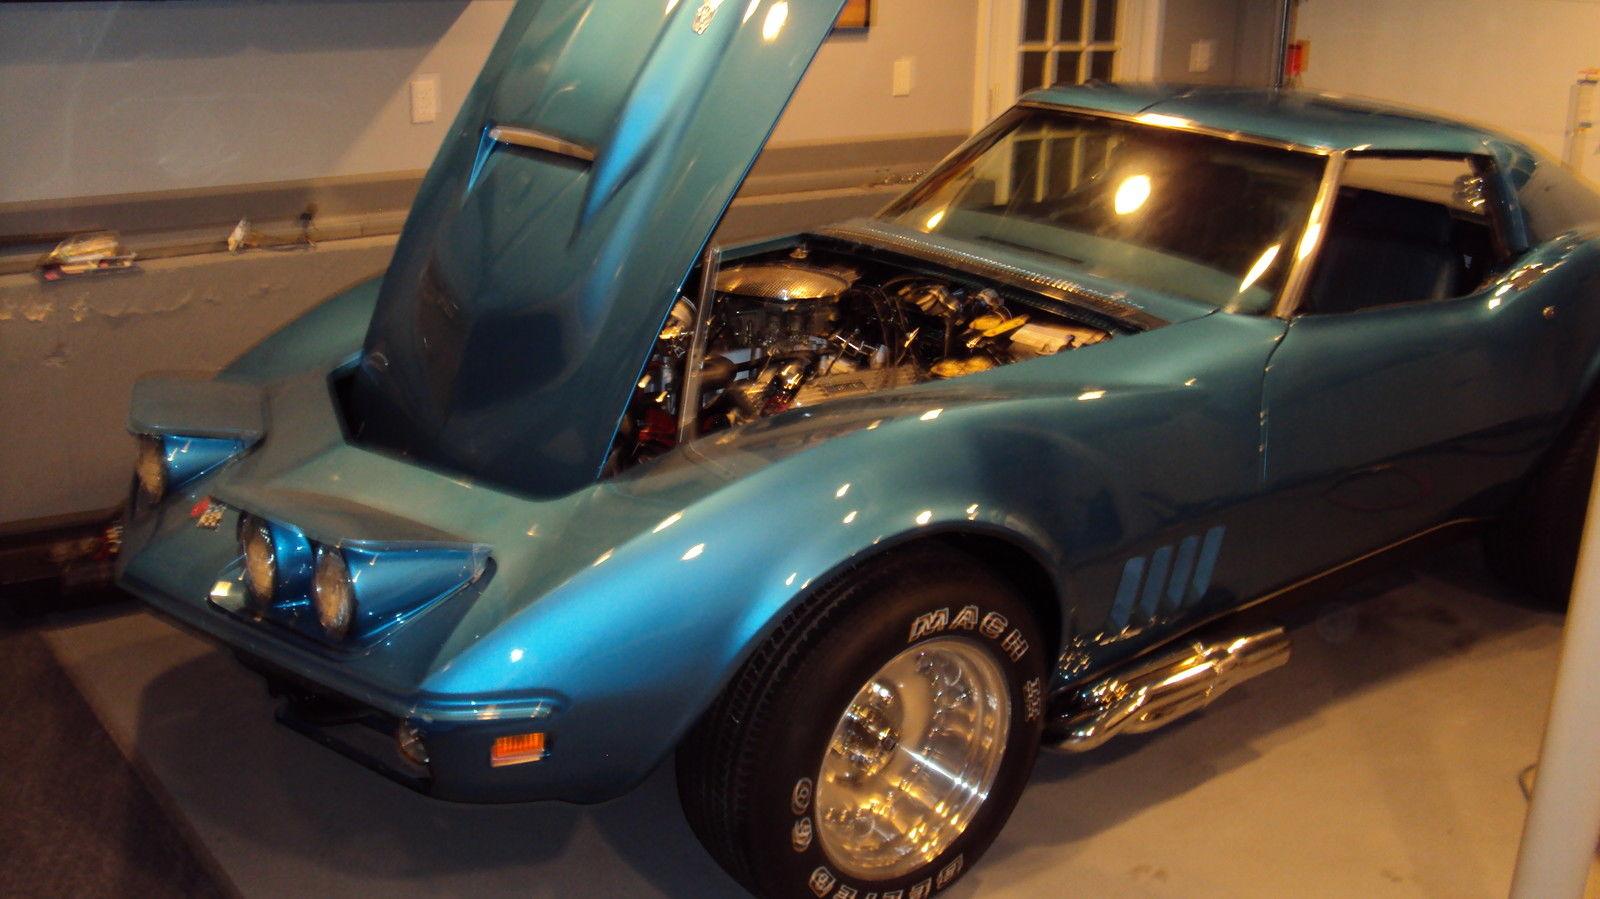 1969 Corvette For Sale >> 1969 Baldwin Motion Corvette - Classic Chevrolet Corvette 1969 for sale